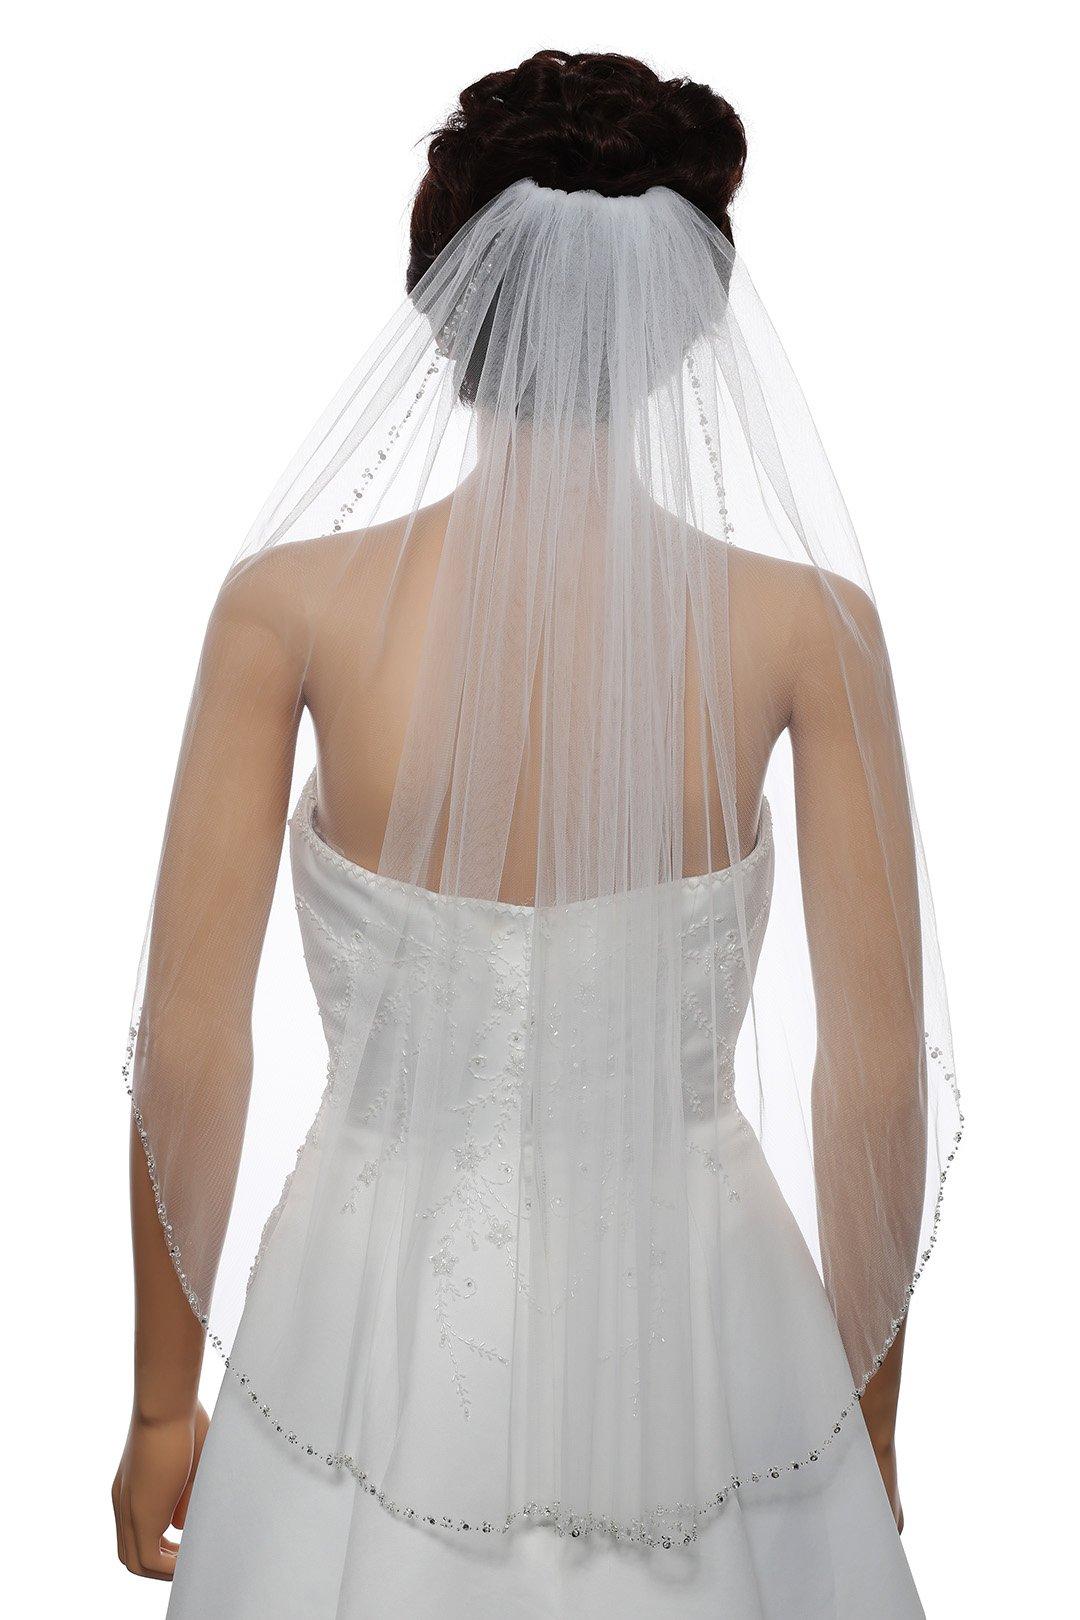 1T Rhinestone Pearl Sequin Beaded Wedding Veil - White Elbow Length 30'' V478 by SAMKY